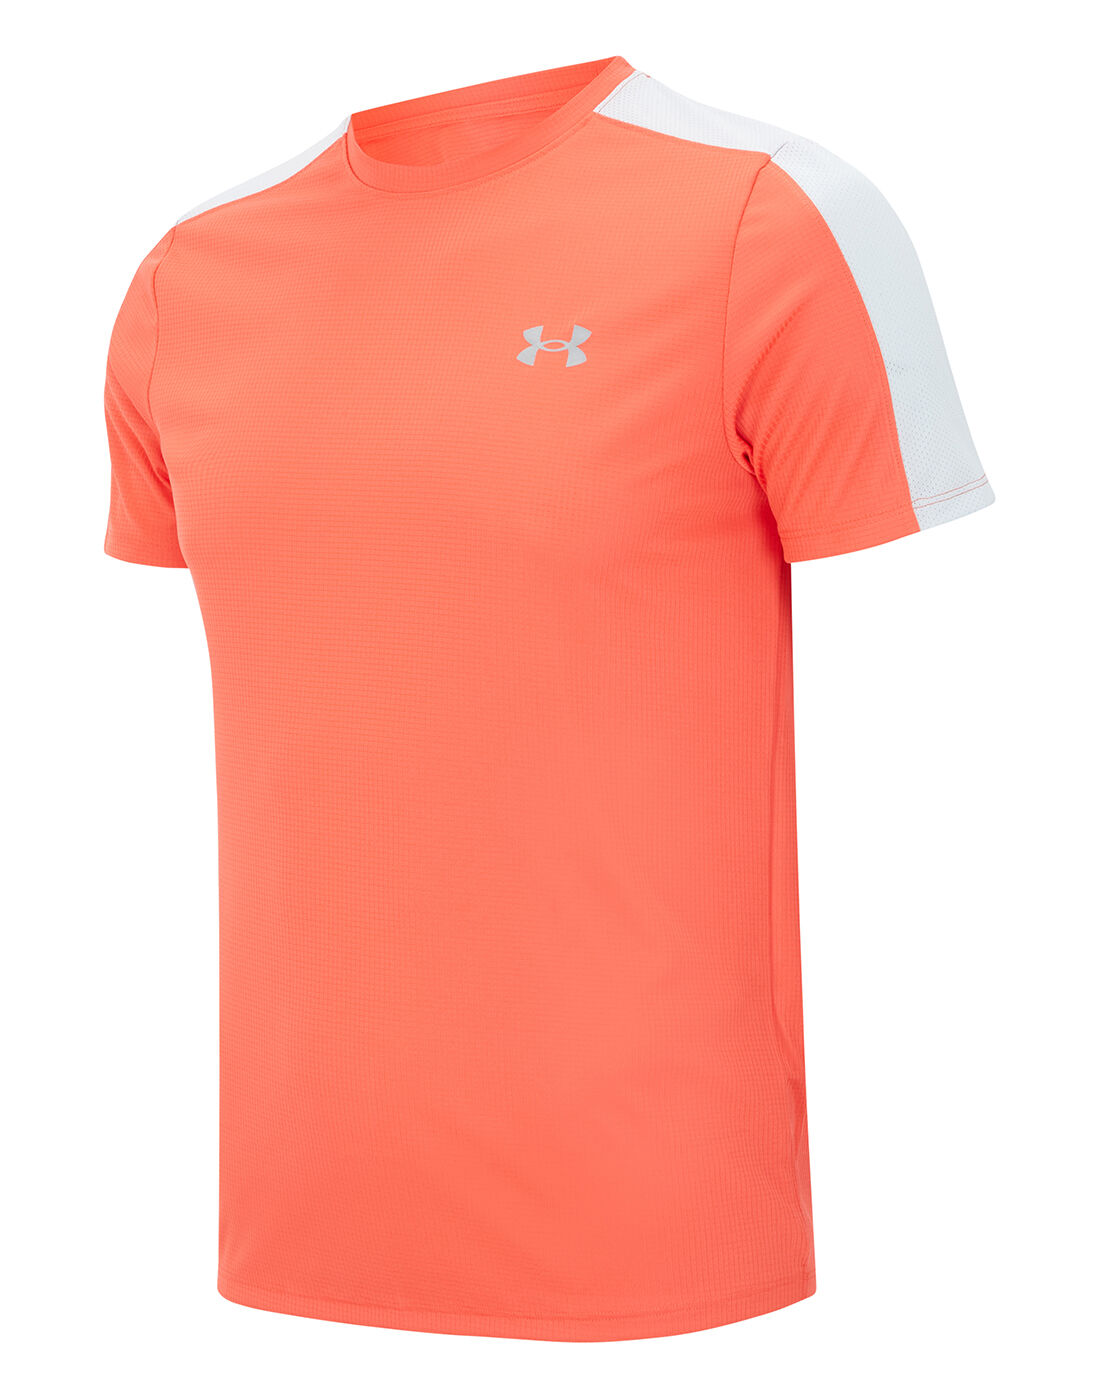 Under Armour Mens Speed Stride Running T-Shirt - Red | nike presto ...